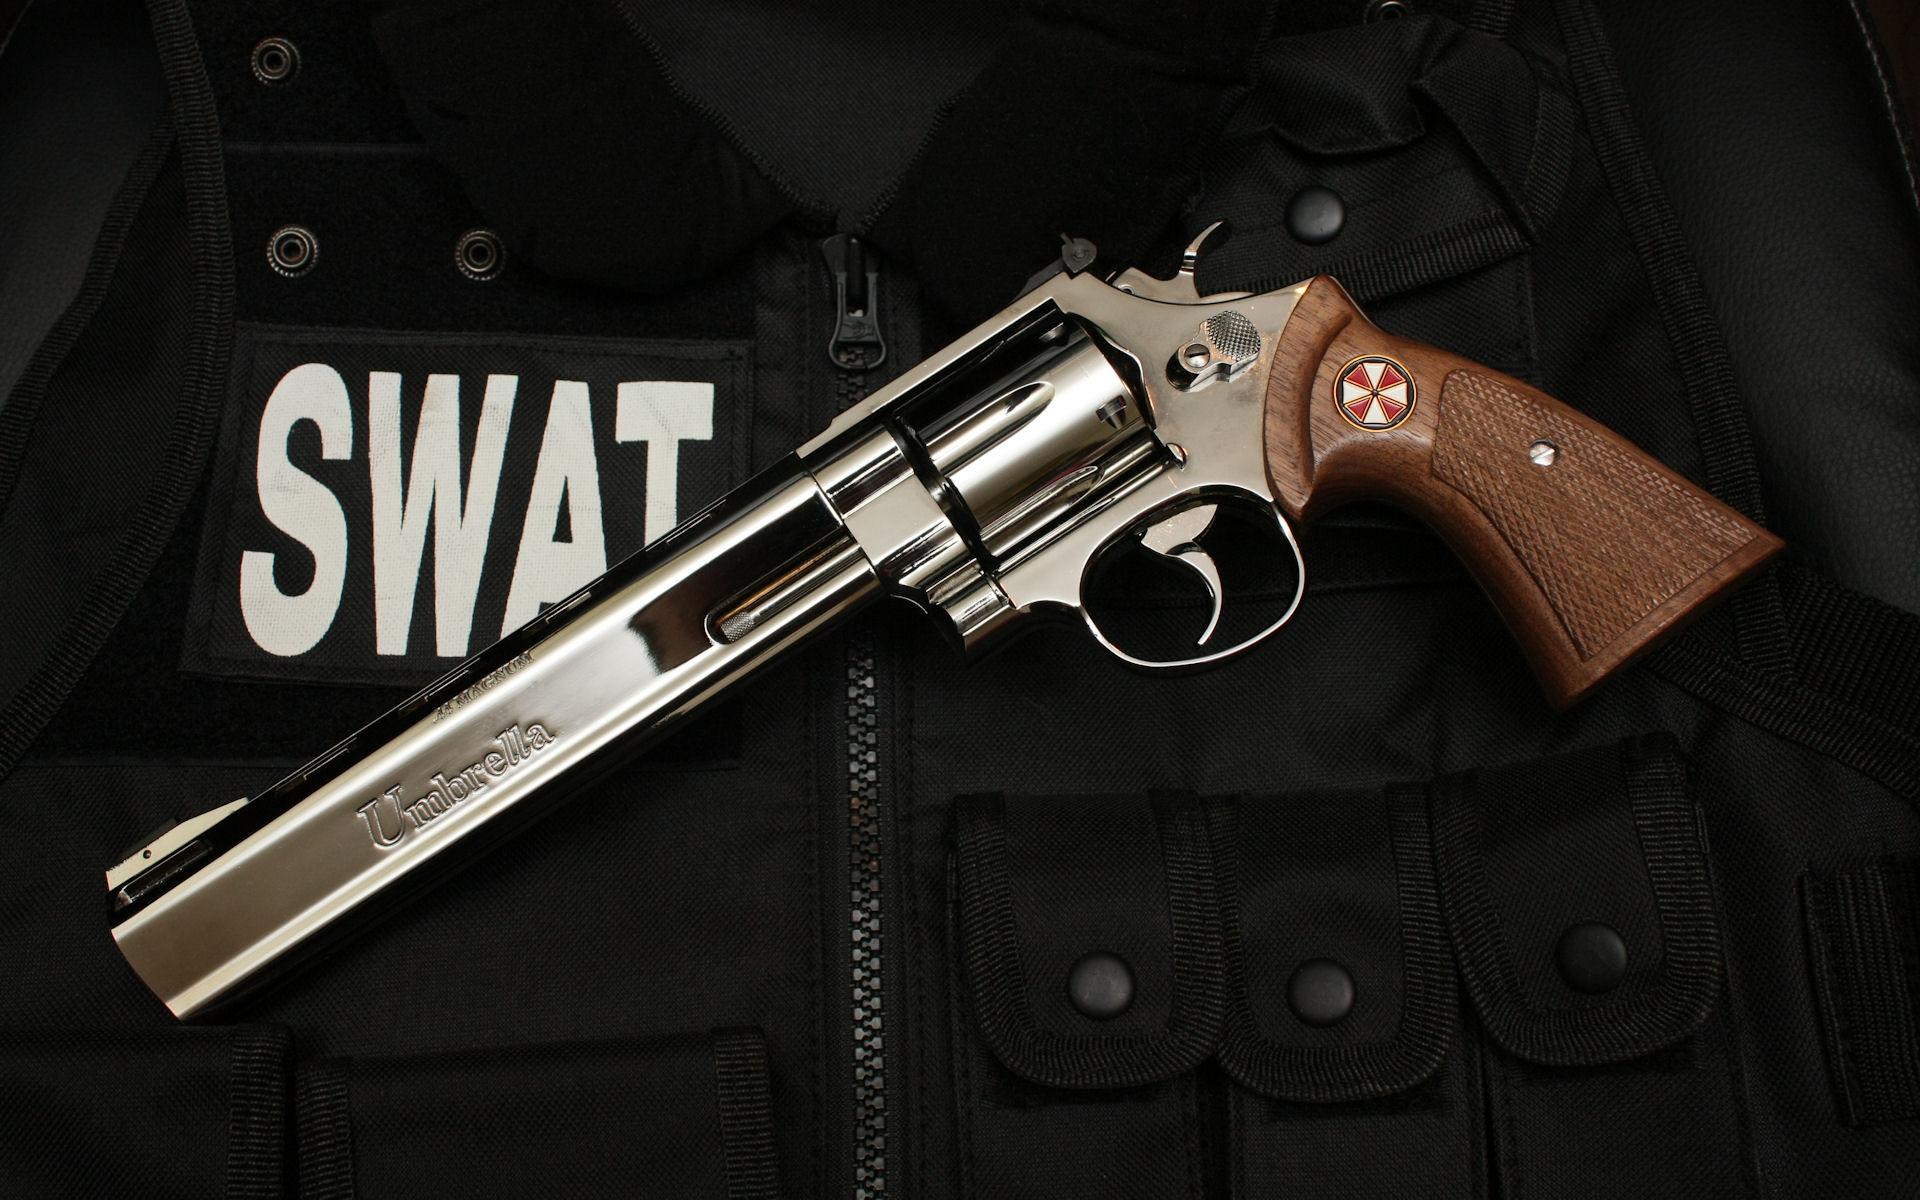 Guns SWAT Wallpaper 1920x1200 Guns SWAT Revolvers Weapons 1920x1200